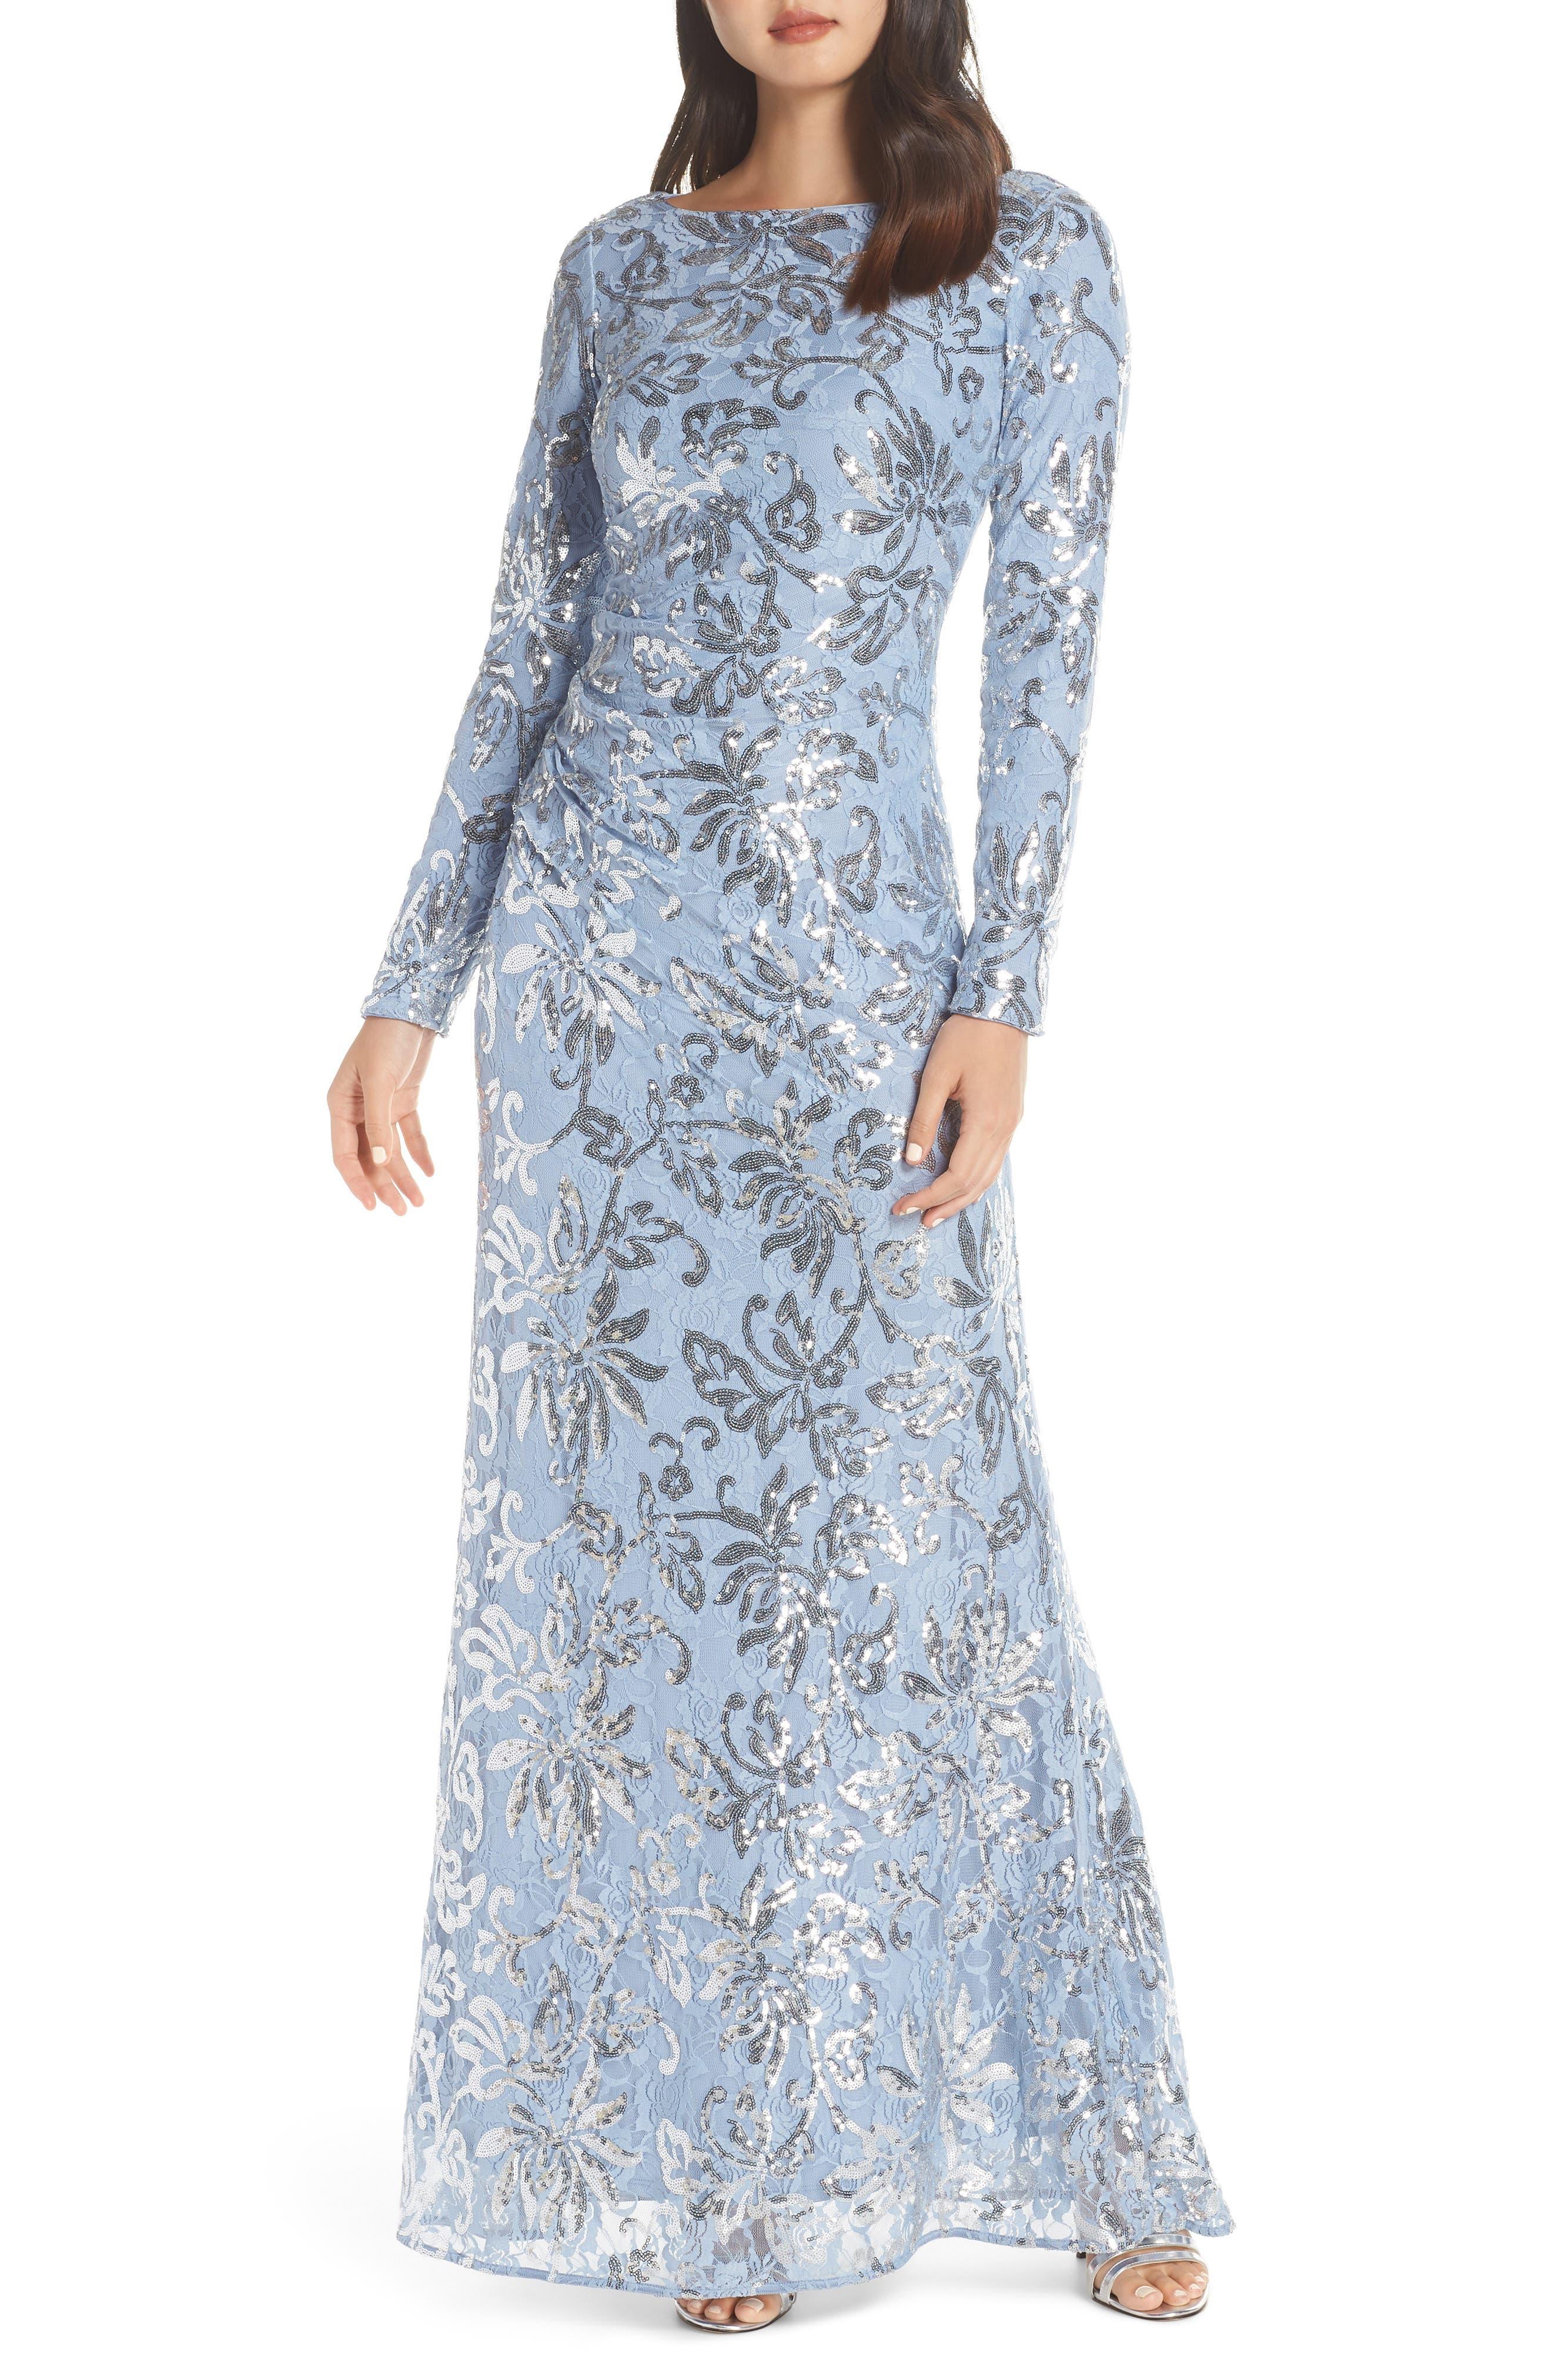 VINCE CAMUTO, Lace & Sequin Evening Dress, Alternate thumbnail 6, color, SKY BLUE